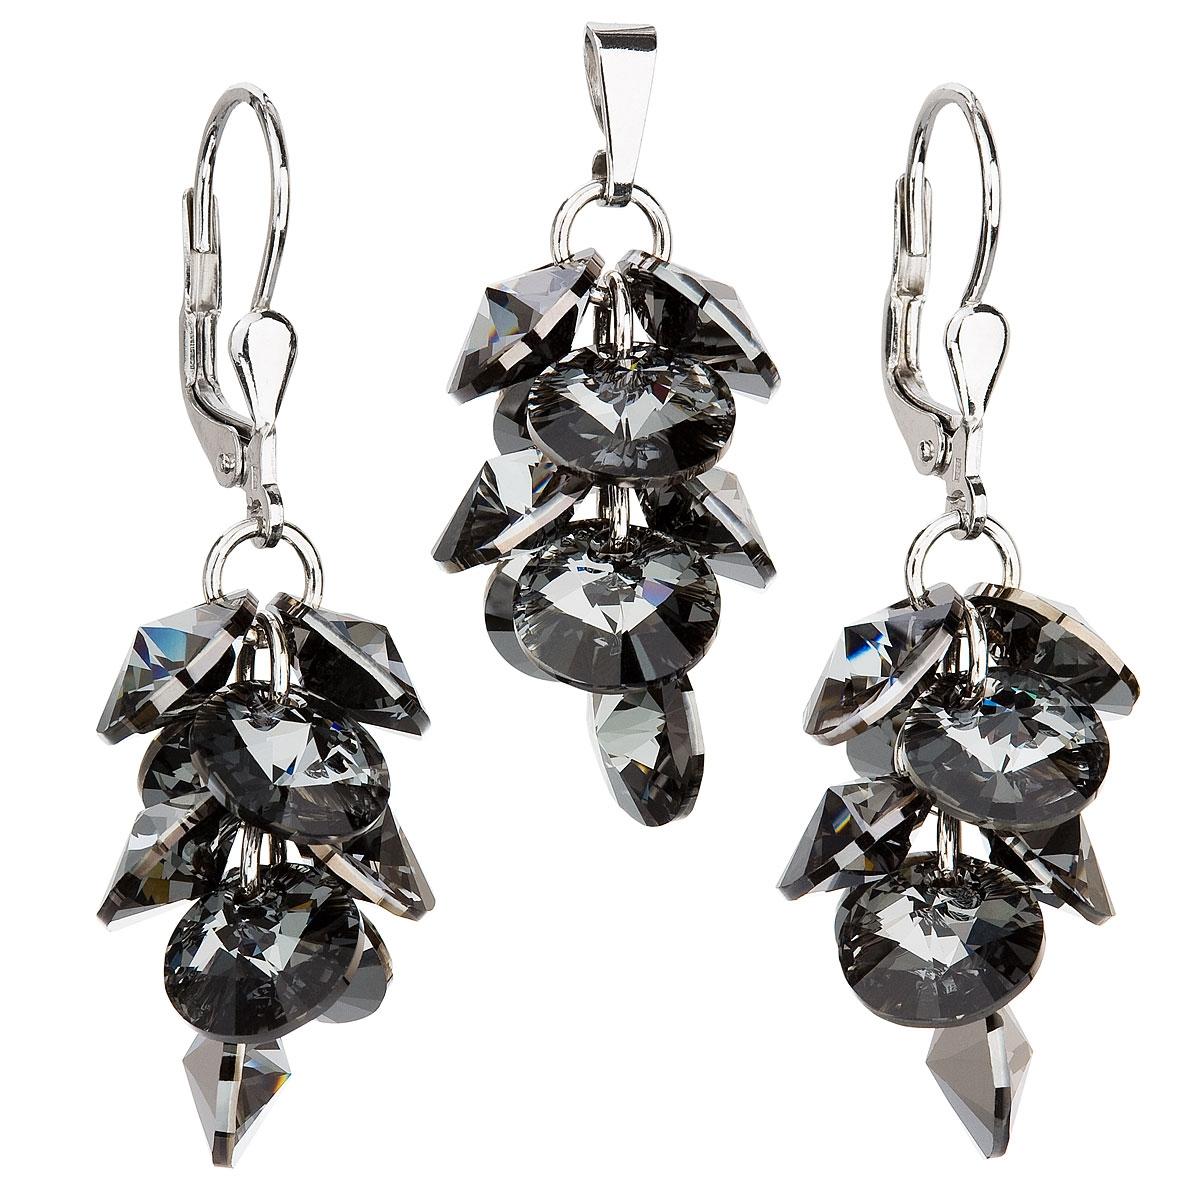 Sada šperků - hrozen se šedými kameny Crystals from Swarovski® EG3038-GR